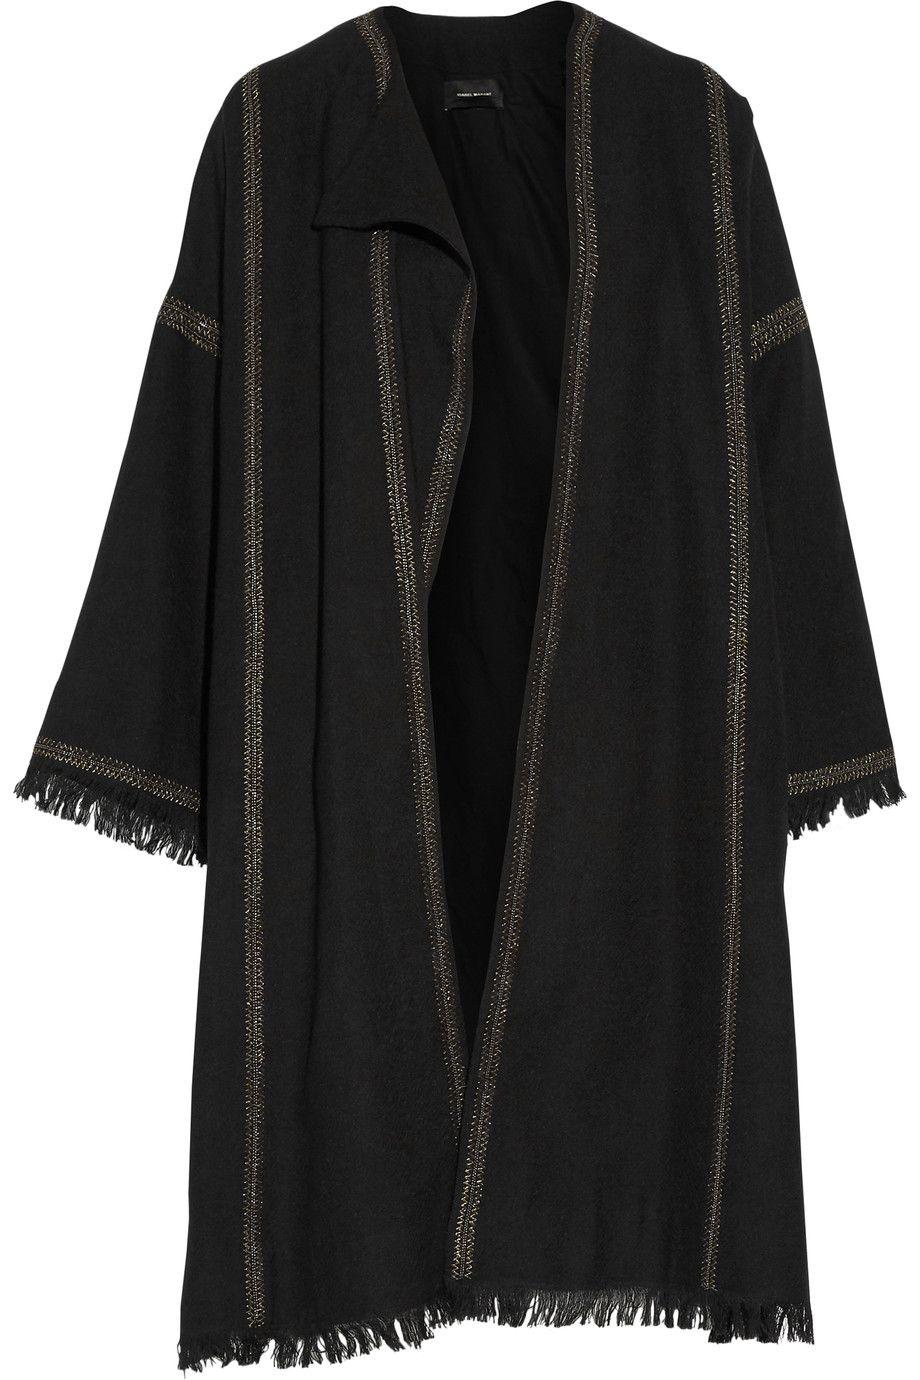 ISABEL MARANT Baxter Embellished Embroidered Wool Coat. #isabelmarant #cloth #coat